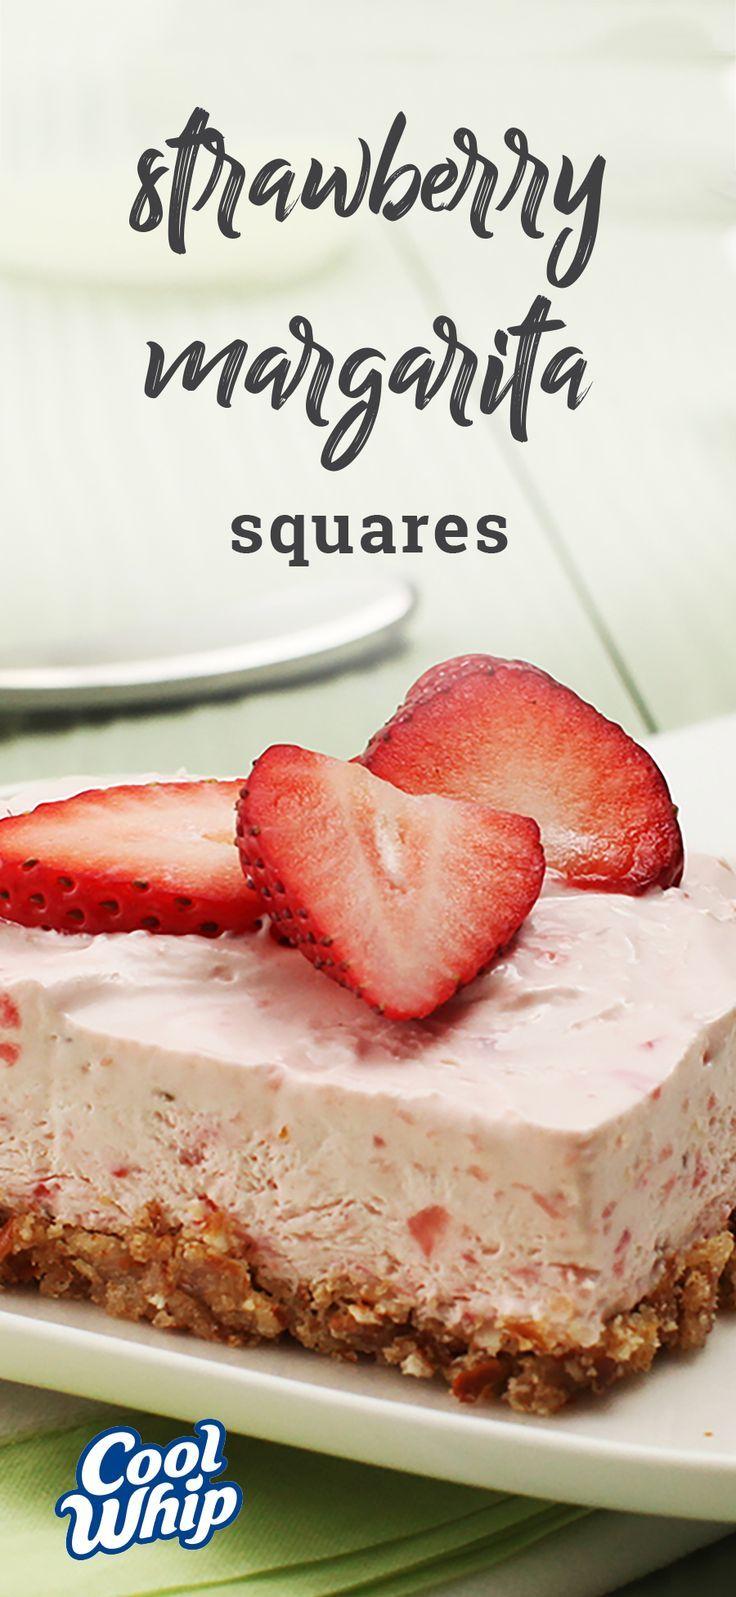 Strawberry Margarita Squares – Enjoy a frozen margarita? This dessert recipe t...   - Dessert Recipes - #Dessert #Enjoy #Frozen #Margarita #recipe #Recipes #SQUARES #Strawberry #frozenmargaritarecipes